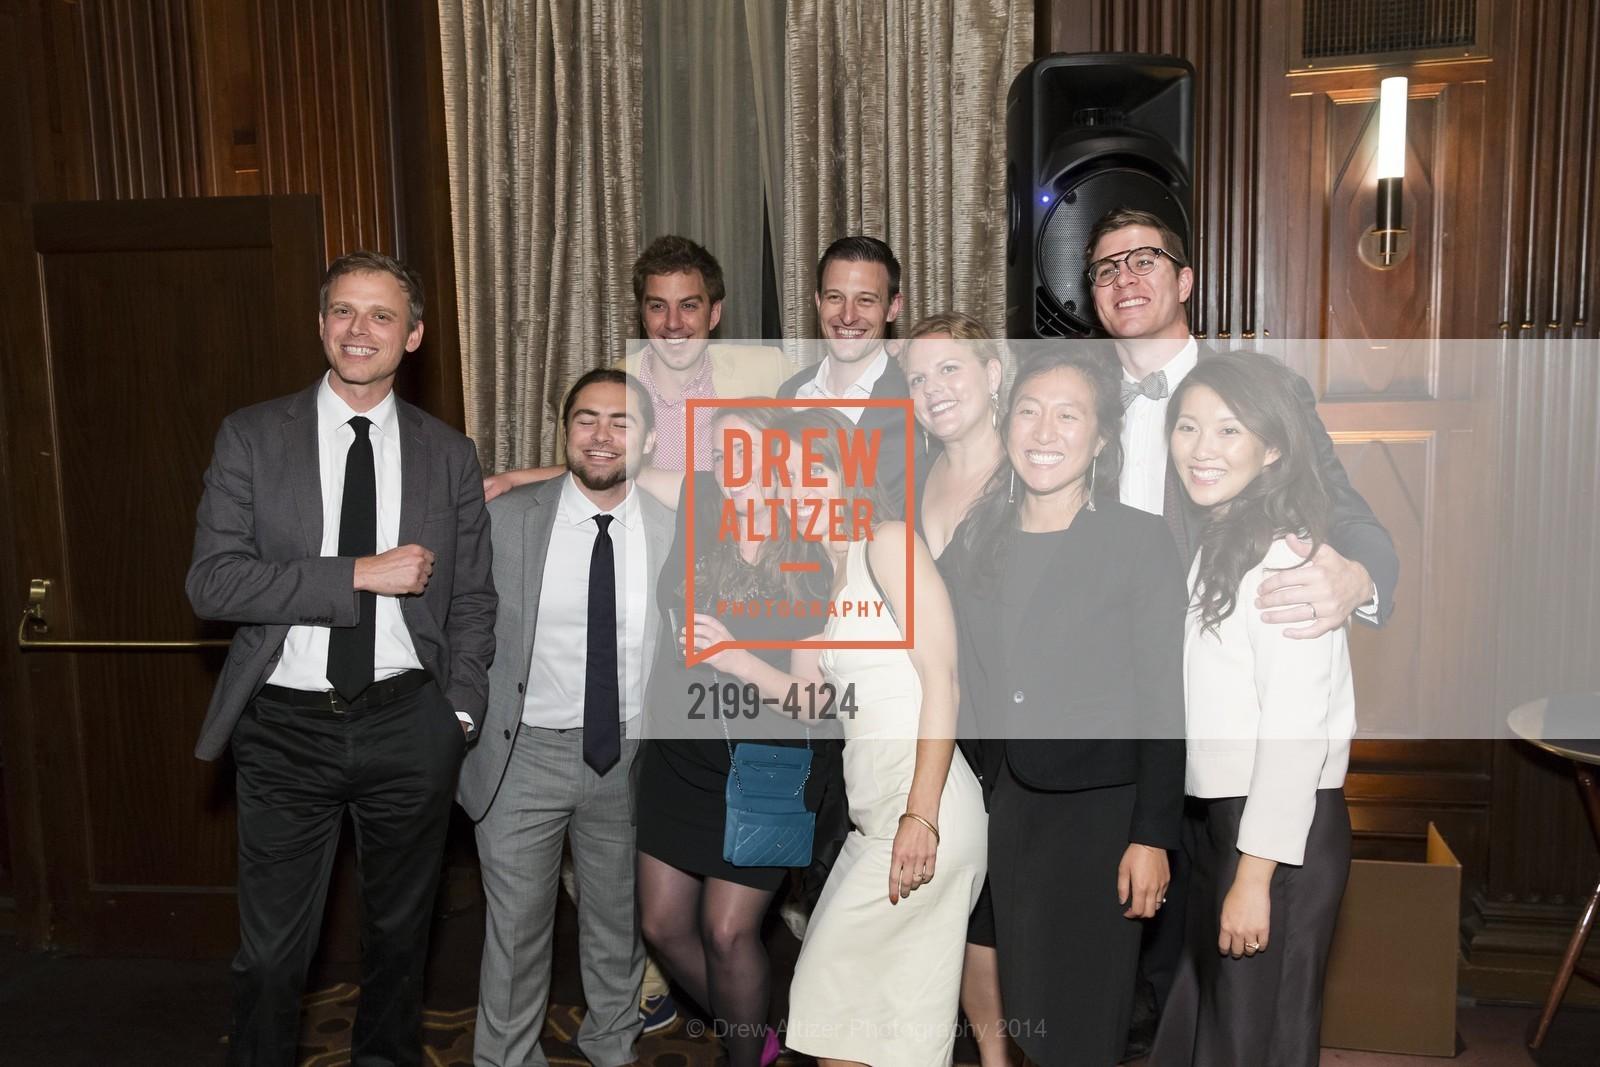 Group, Photo #2199-4124